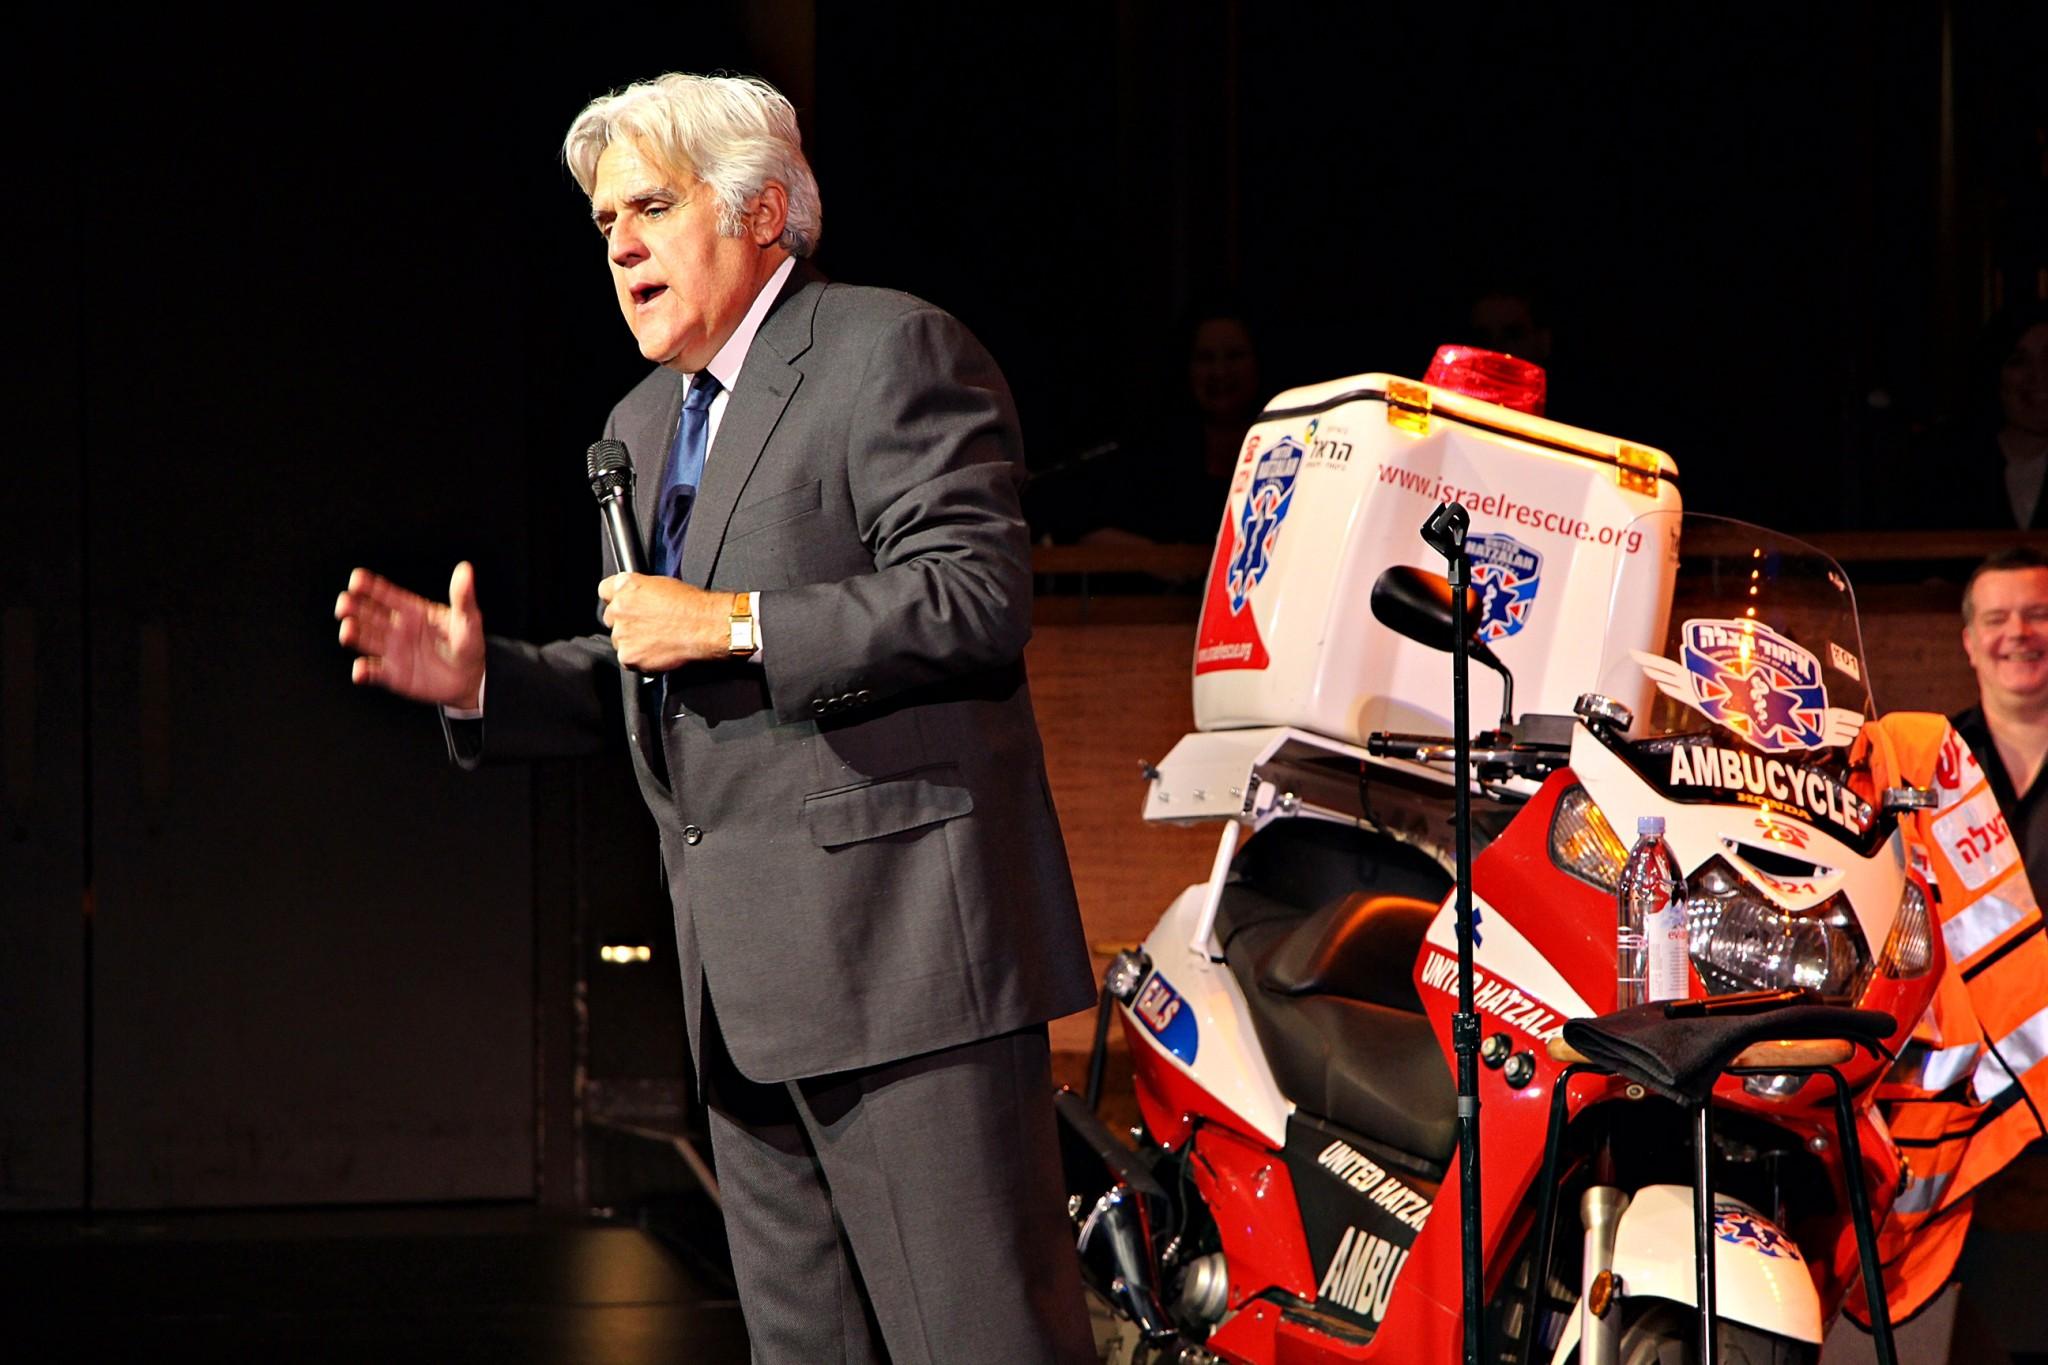 Motorcycle fan Jay Leno gives props to United Hatzalah ambucycle. Photo by Yadin Goldman